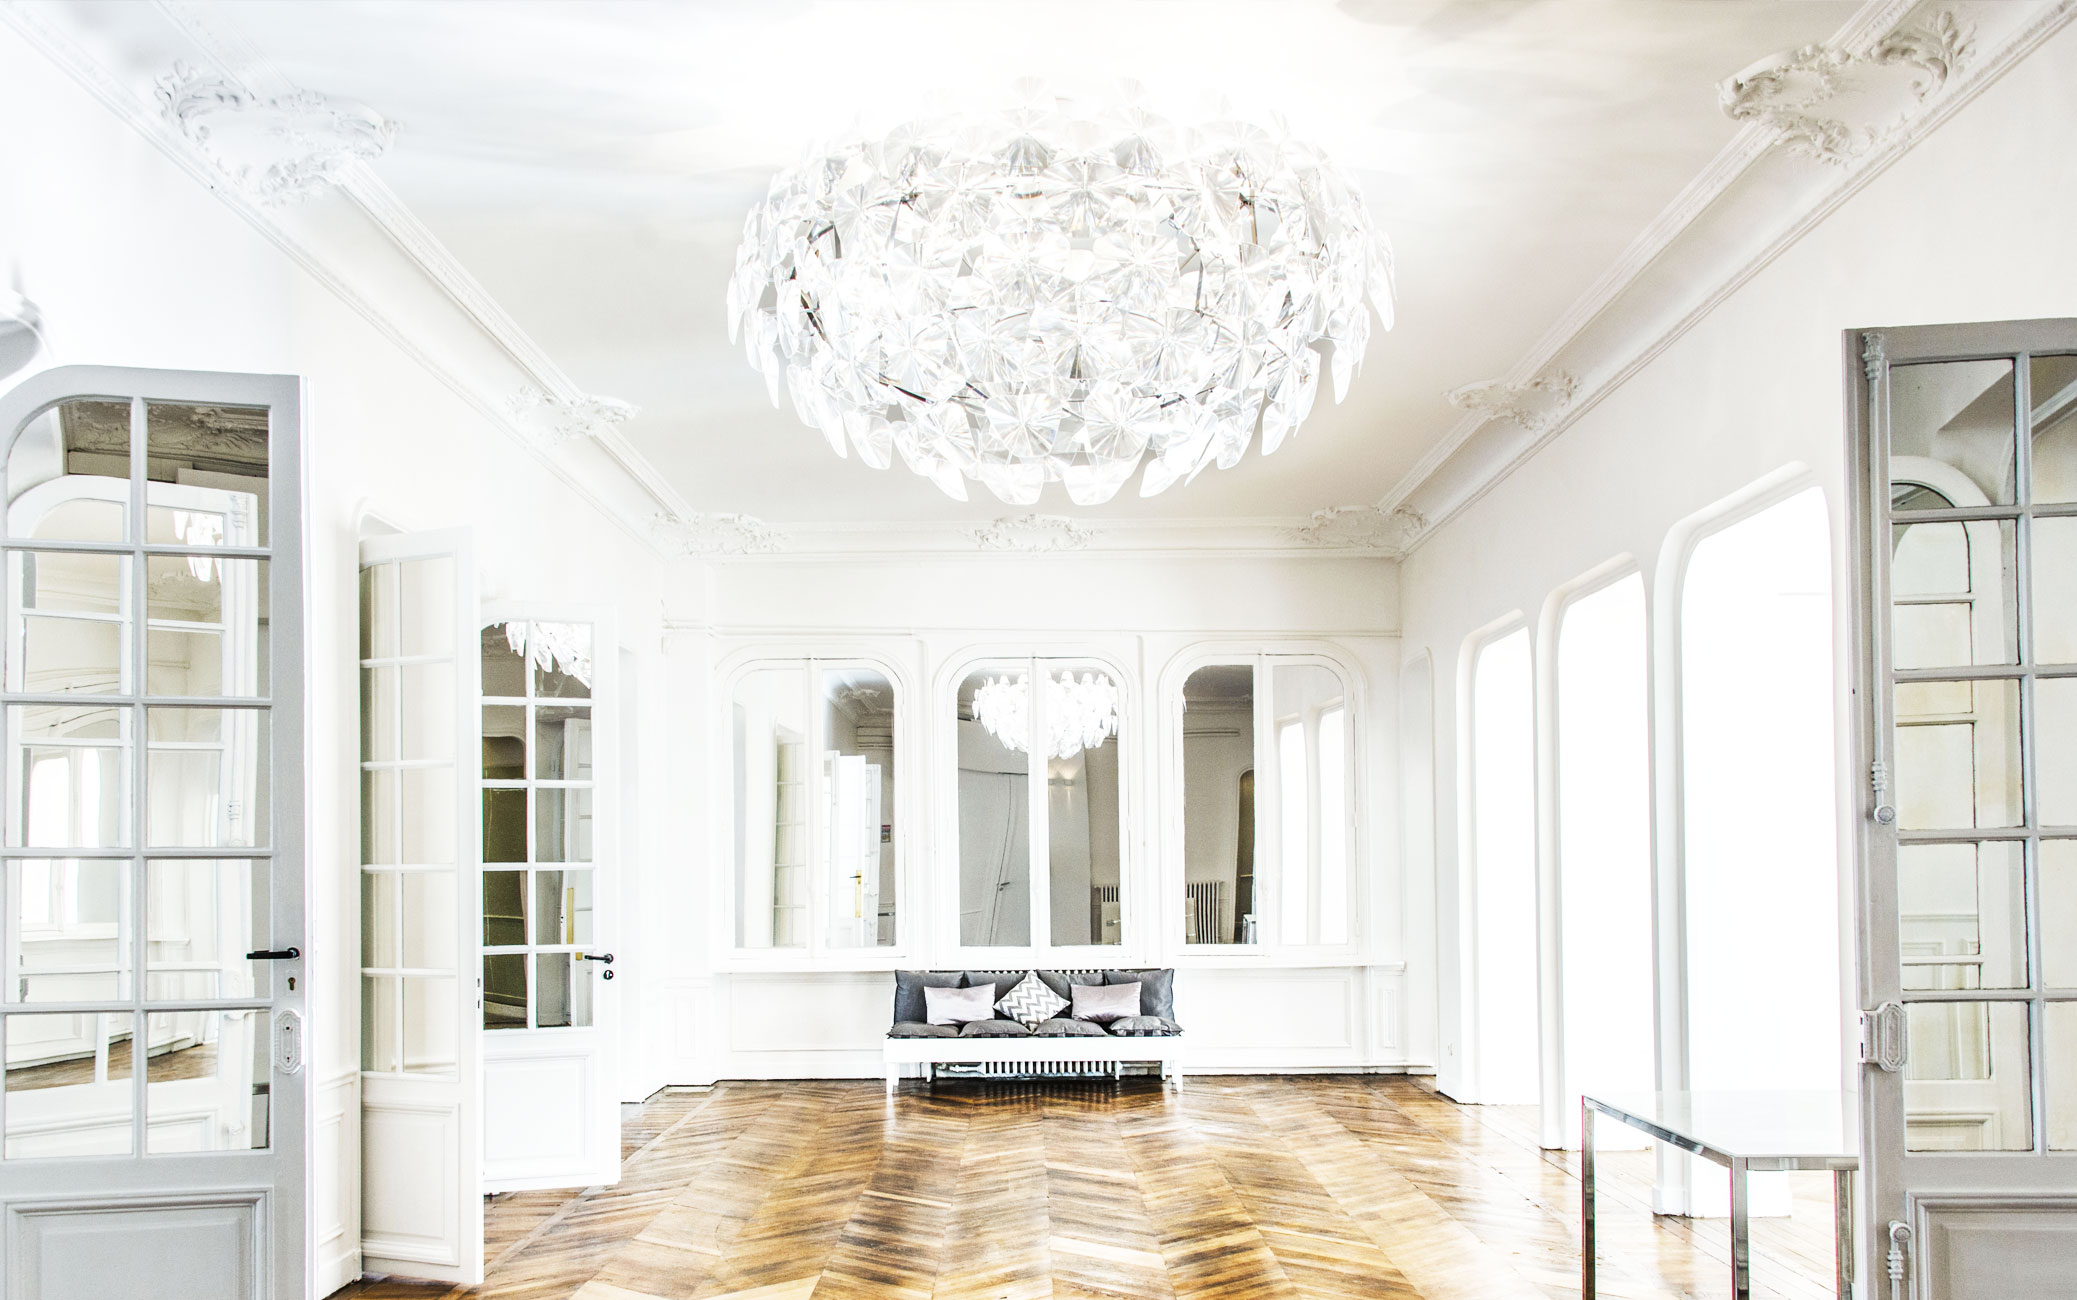 Appartement-Haussmann-lieux-prestiges